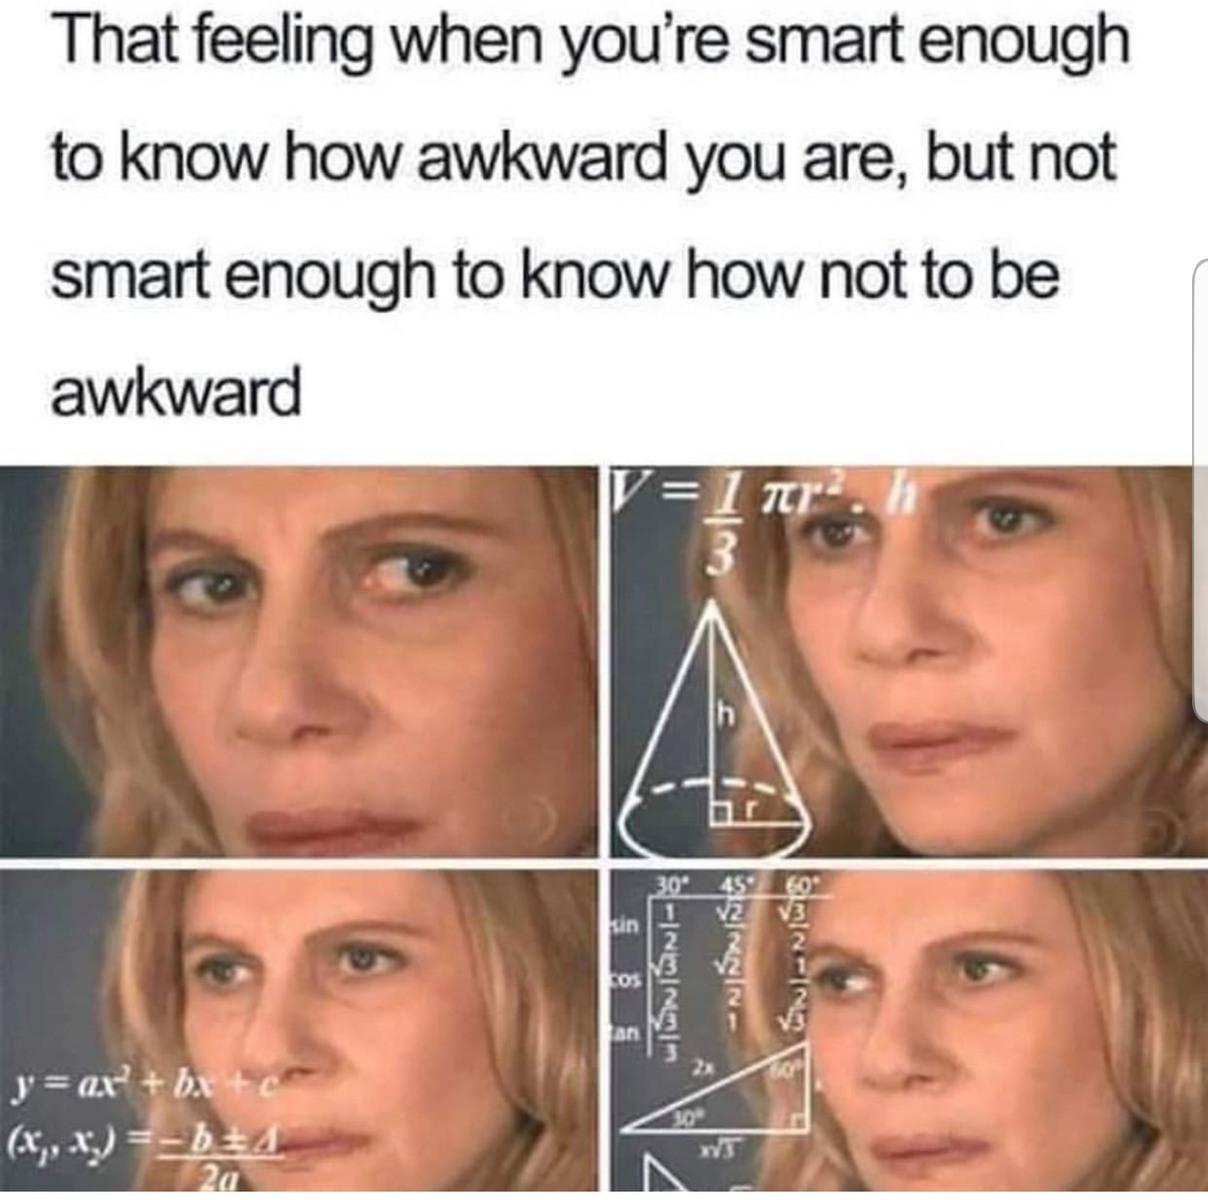 I feel like this describes me pretty well - meme